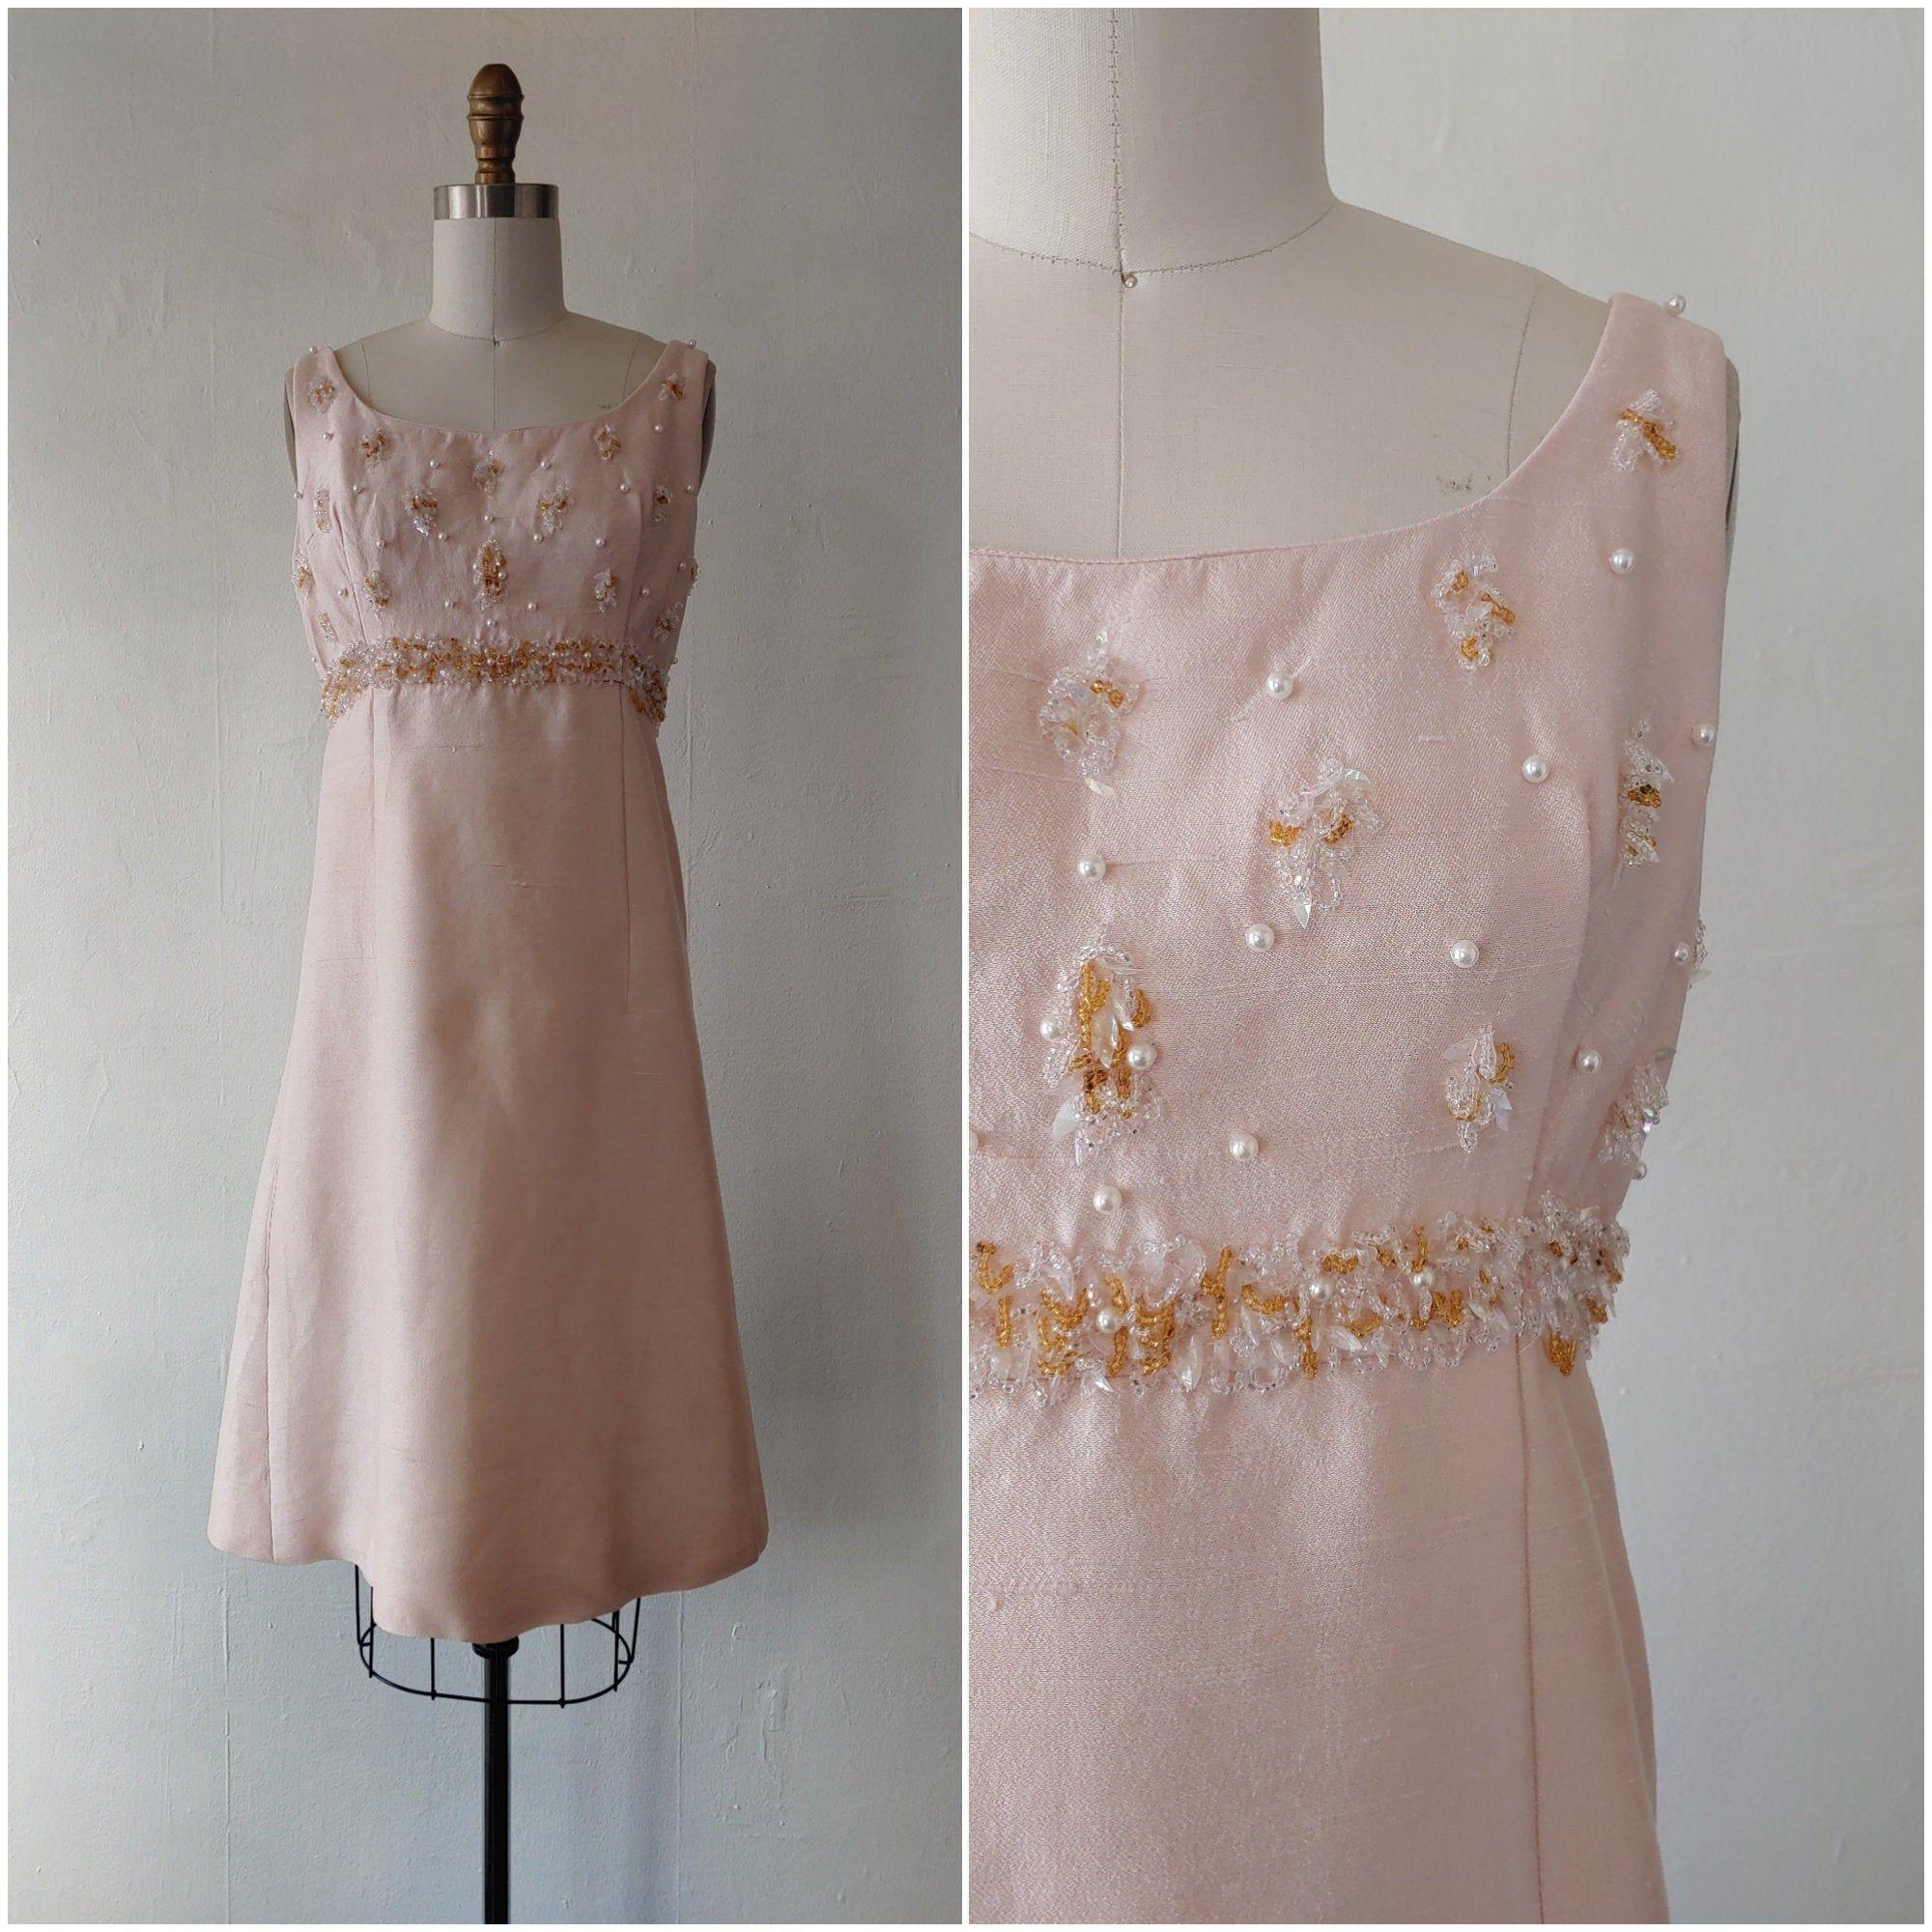 1960s Pink Silk Dress Vintage 1960s Pink Silk Cocktail Dress Etsy [ 2000 x 2000 Pixel ]